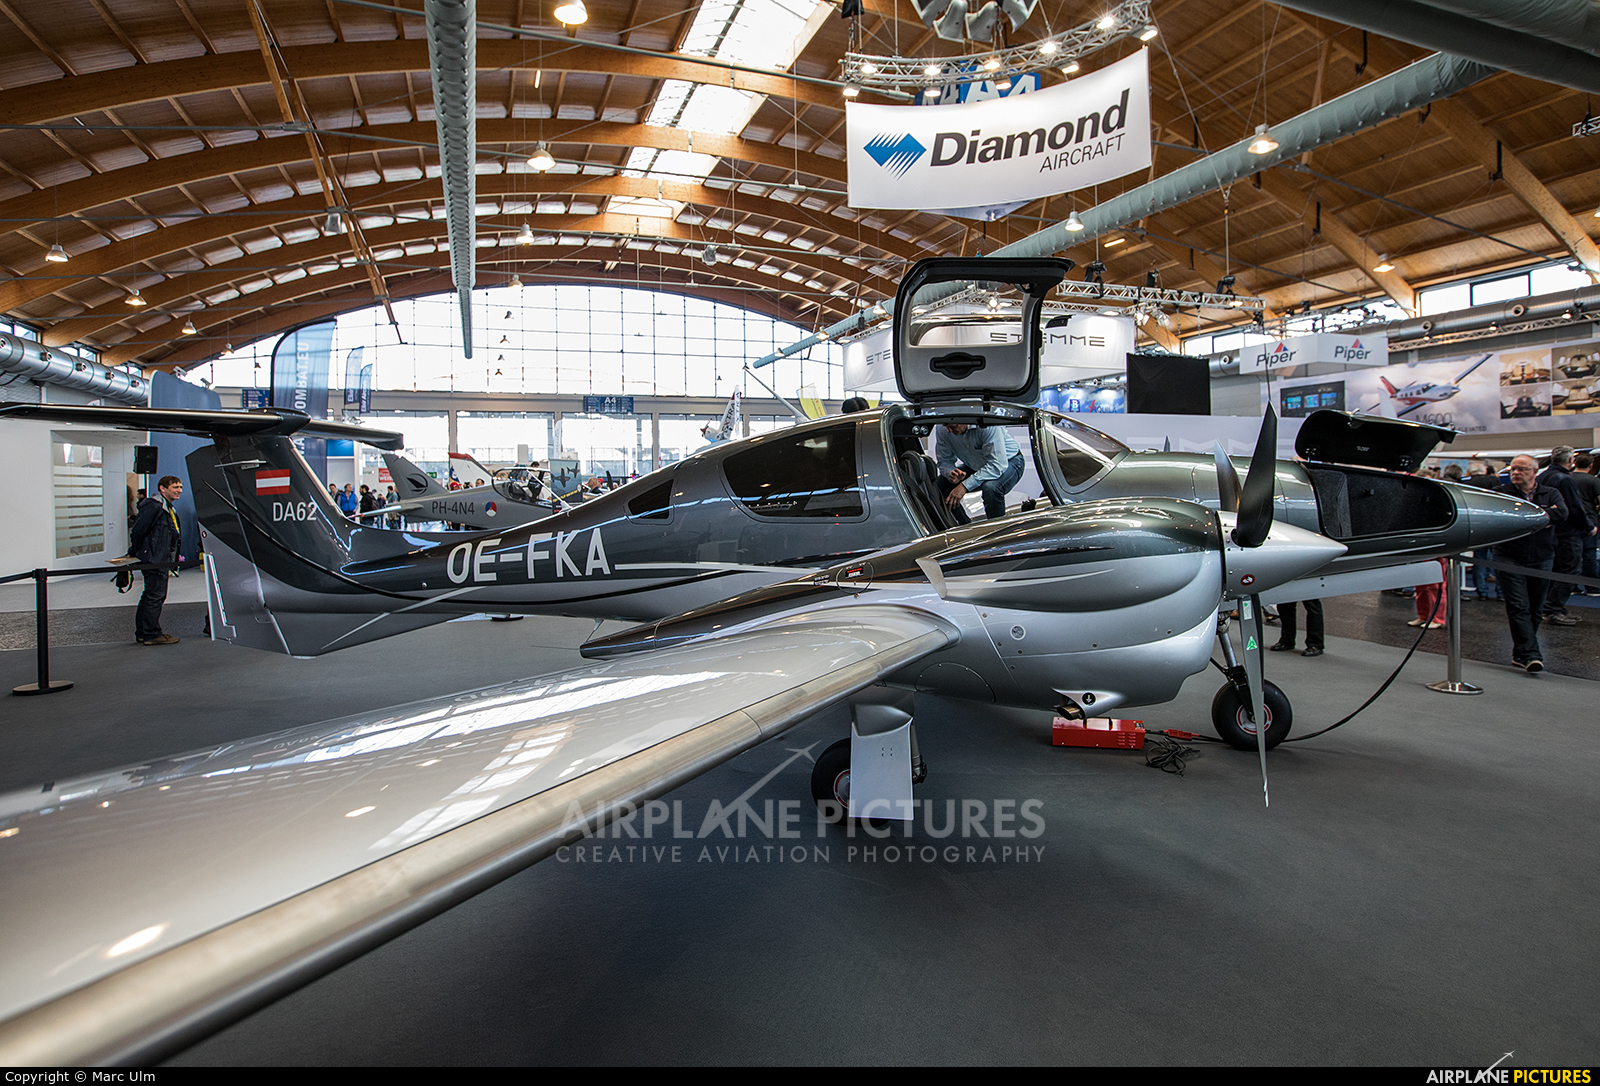 Private OE-FKA aircraft at Friedrichshafen